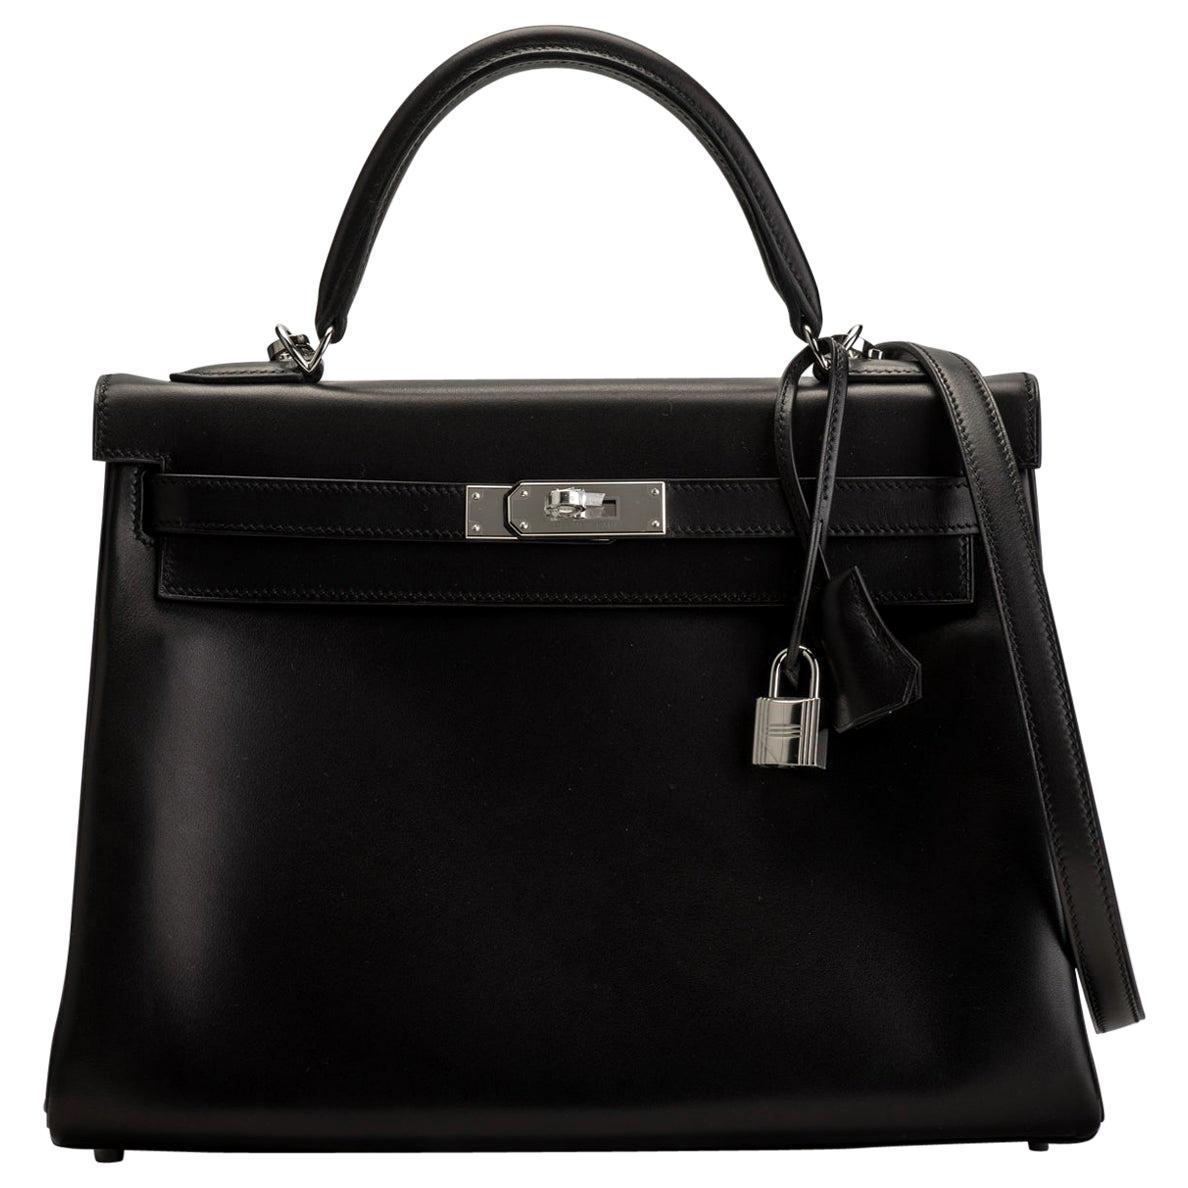 New in Box Hermes Kelly 32 Black Evercalf Bag